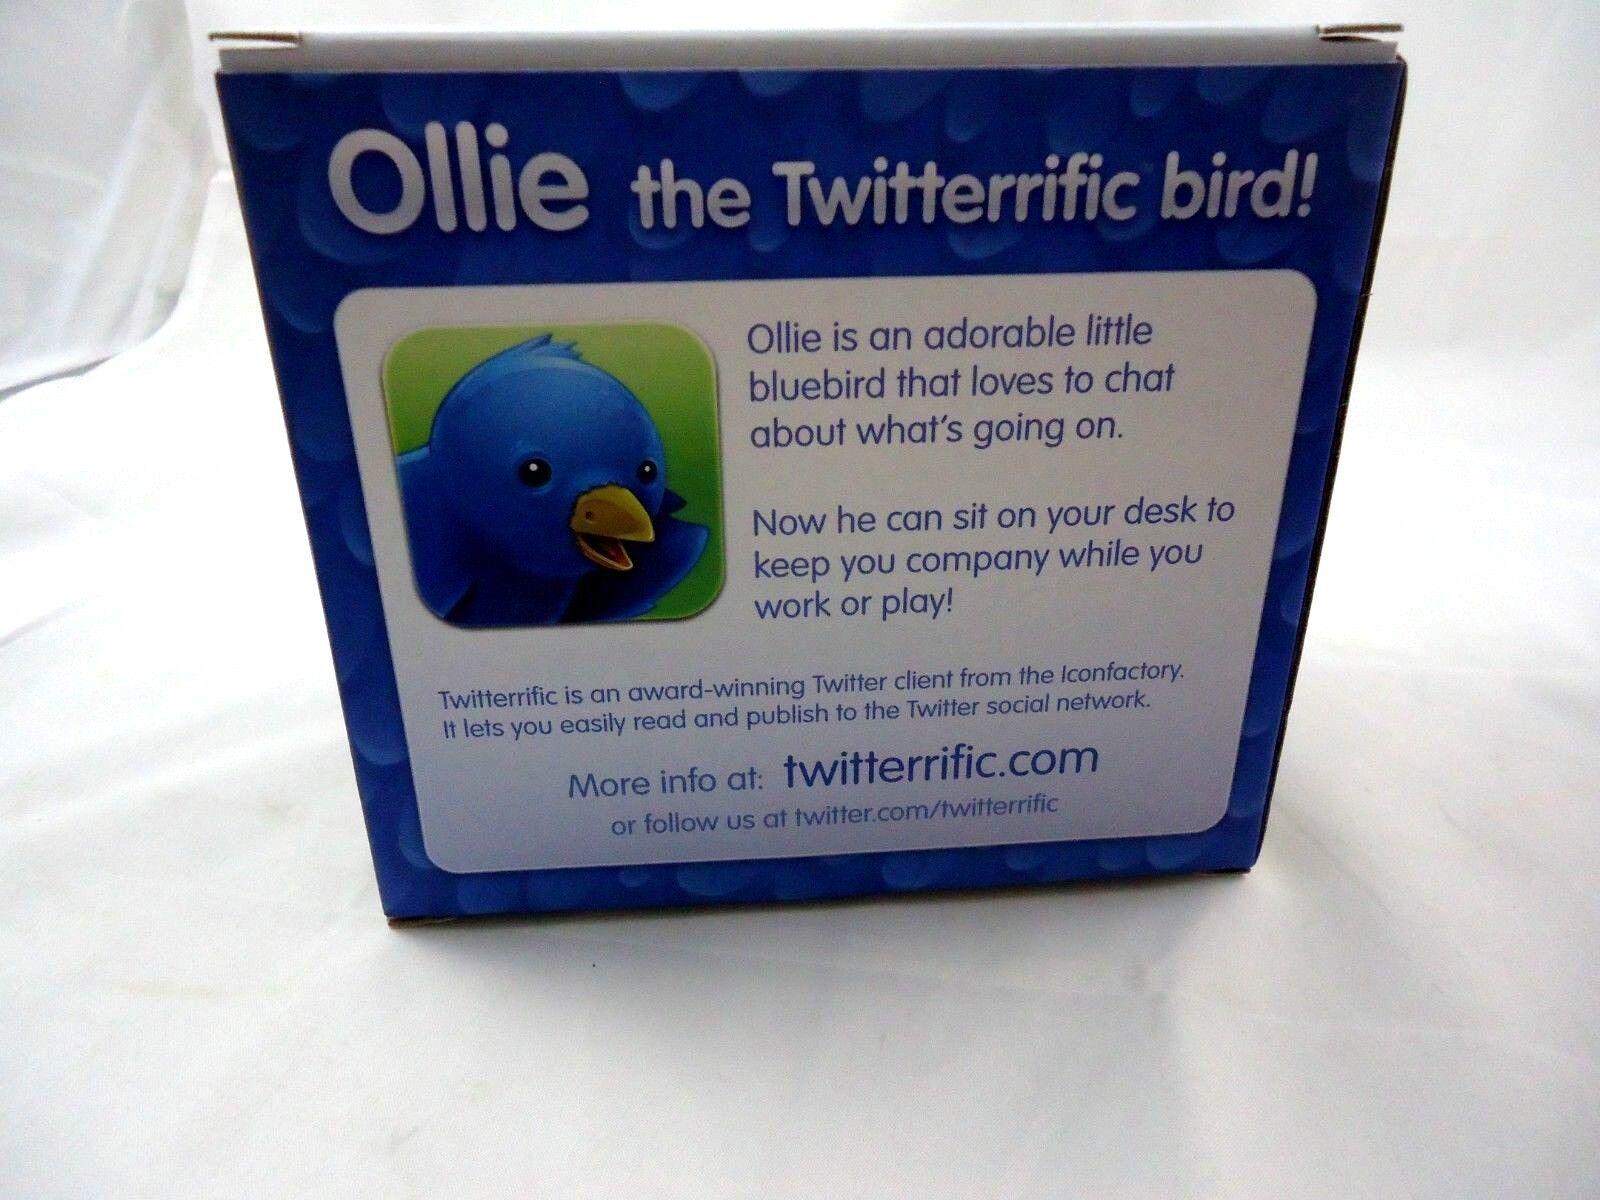 Ollie The Twitterrific edition Bird limited edition Twitterrific vintage monochrome edition le 100 b7b7a1